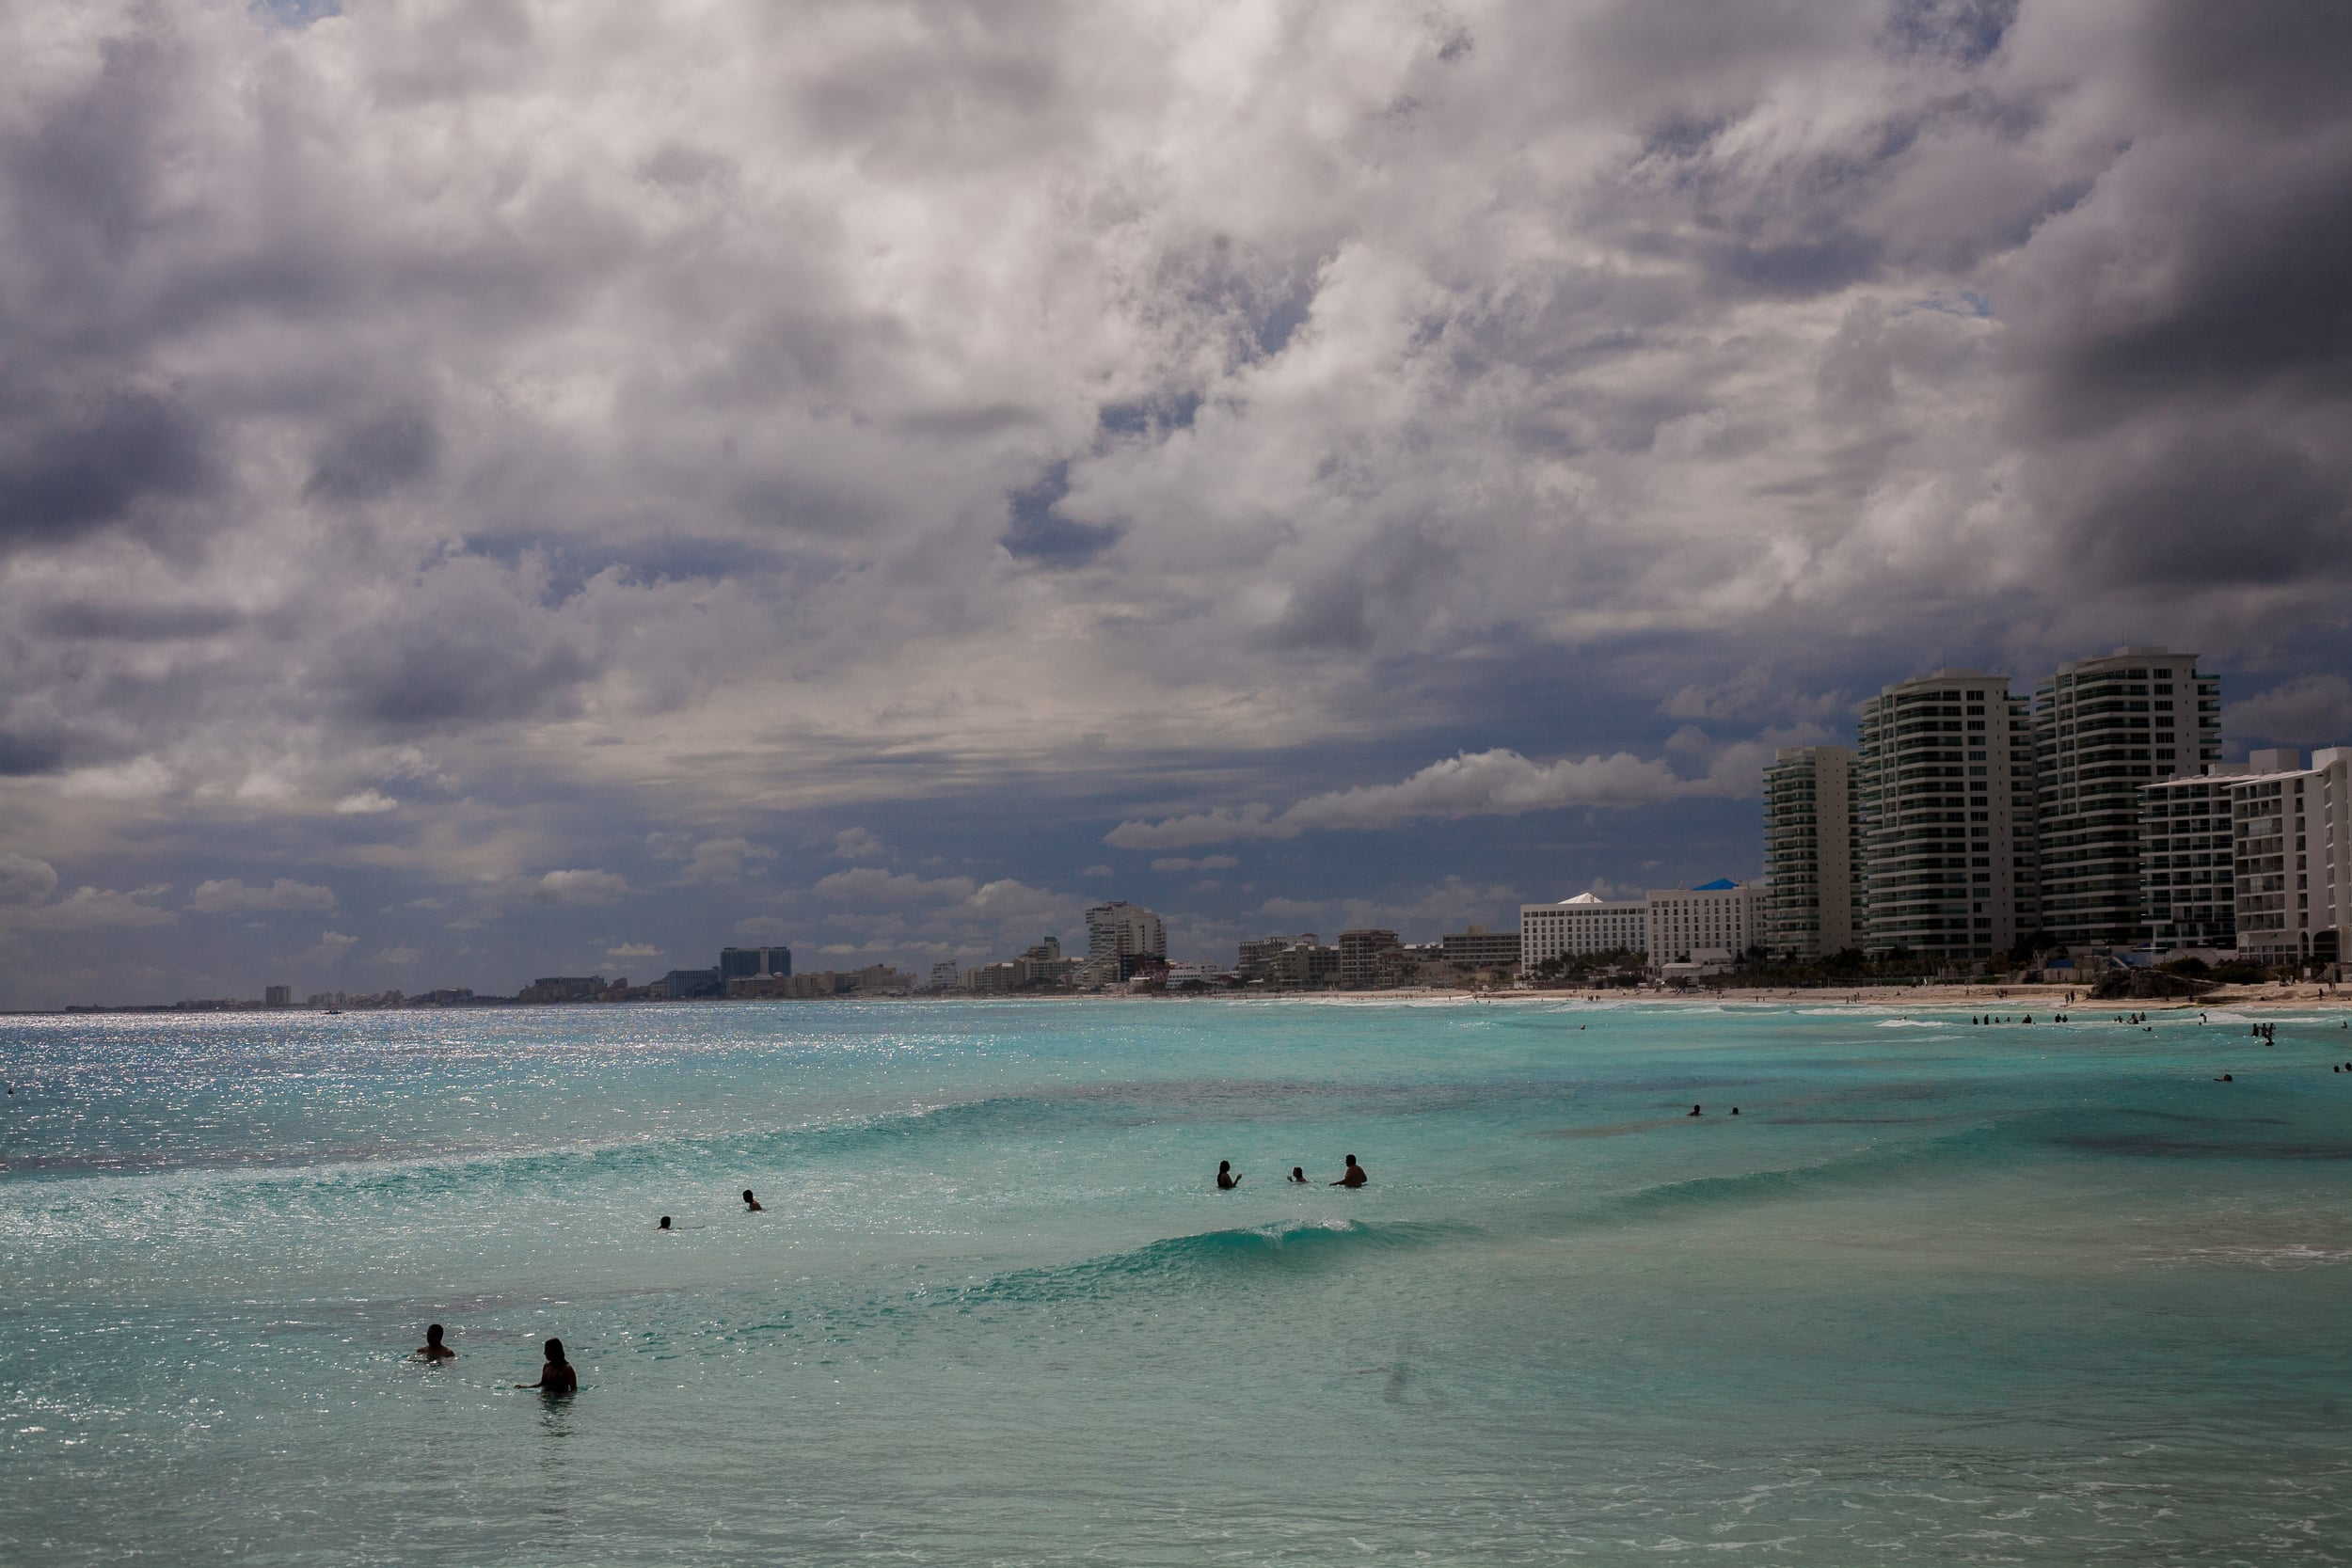 cancun2016-9853.jpg